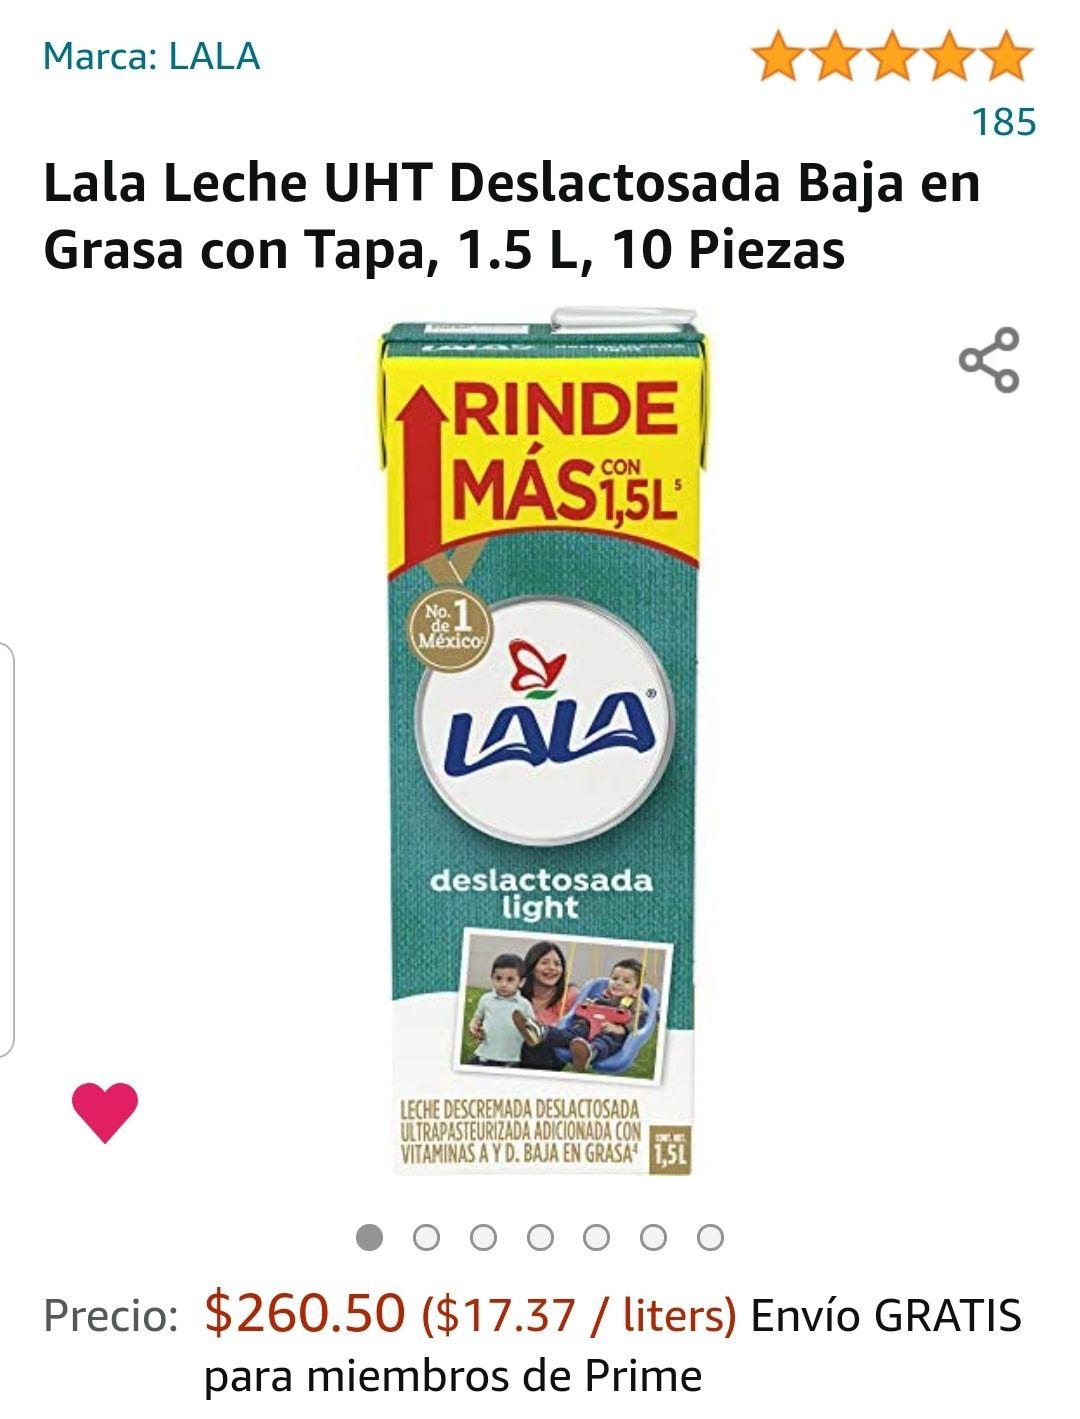 Amazon: Lala Leche UHT Deslactosada Baja en Grasa con Tapa, 1.5 L, 10 Piezas